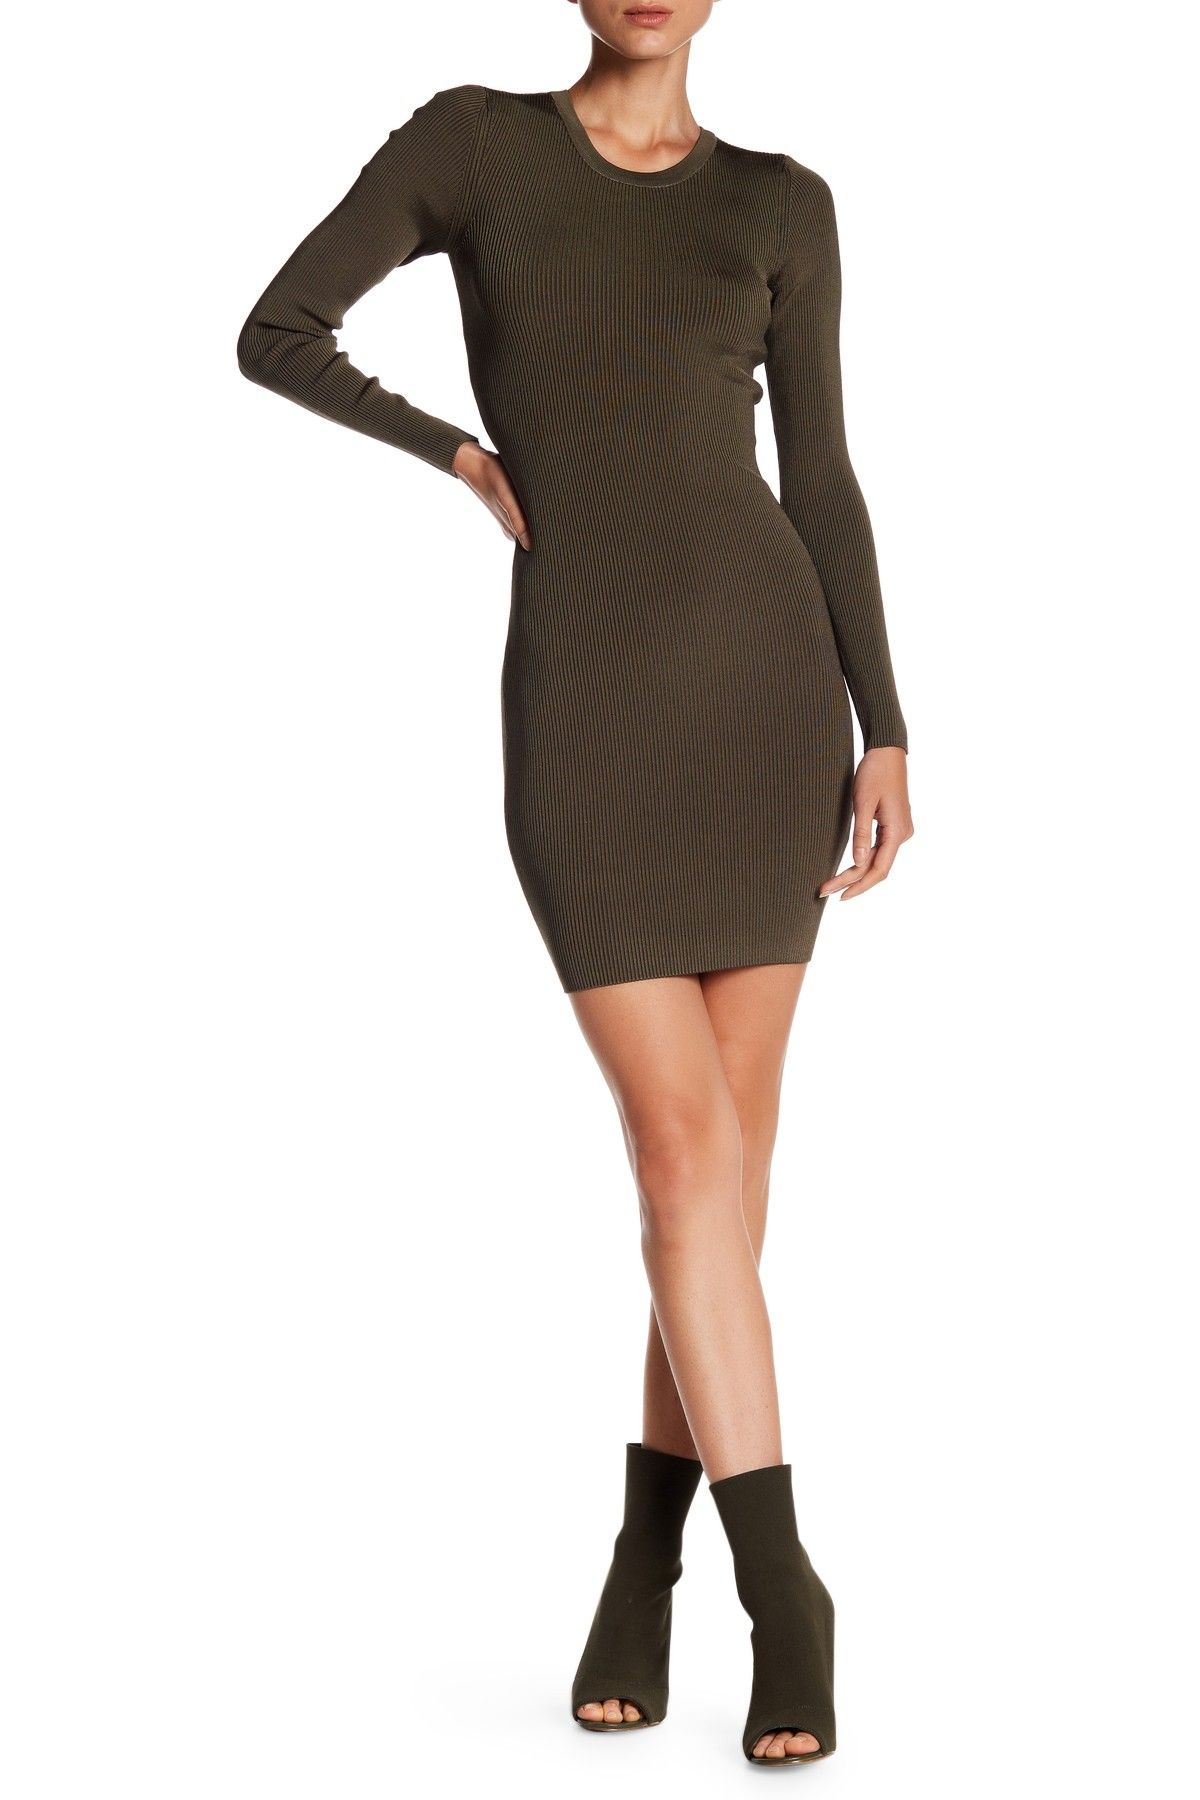 ARC Mia Dress Nordstrom dresses, Fashion, Dresses